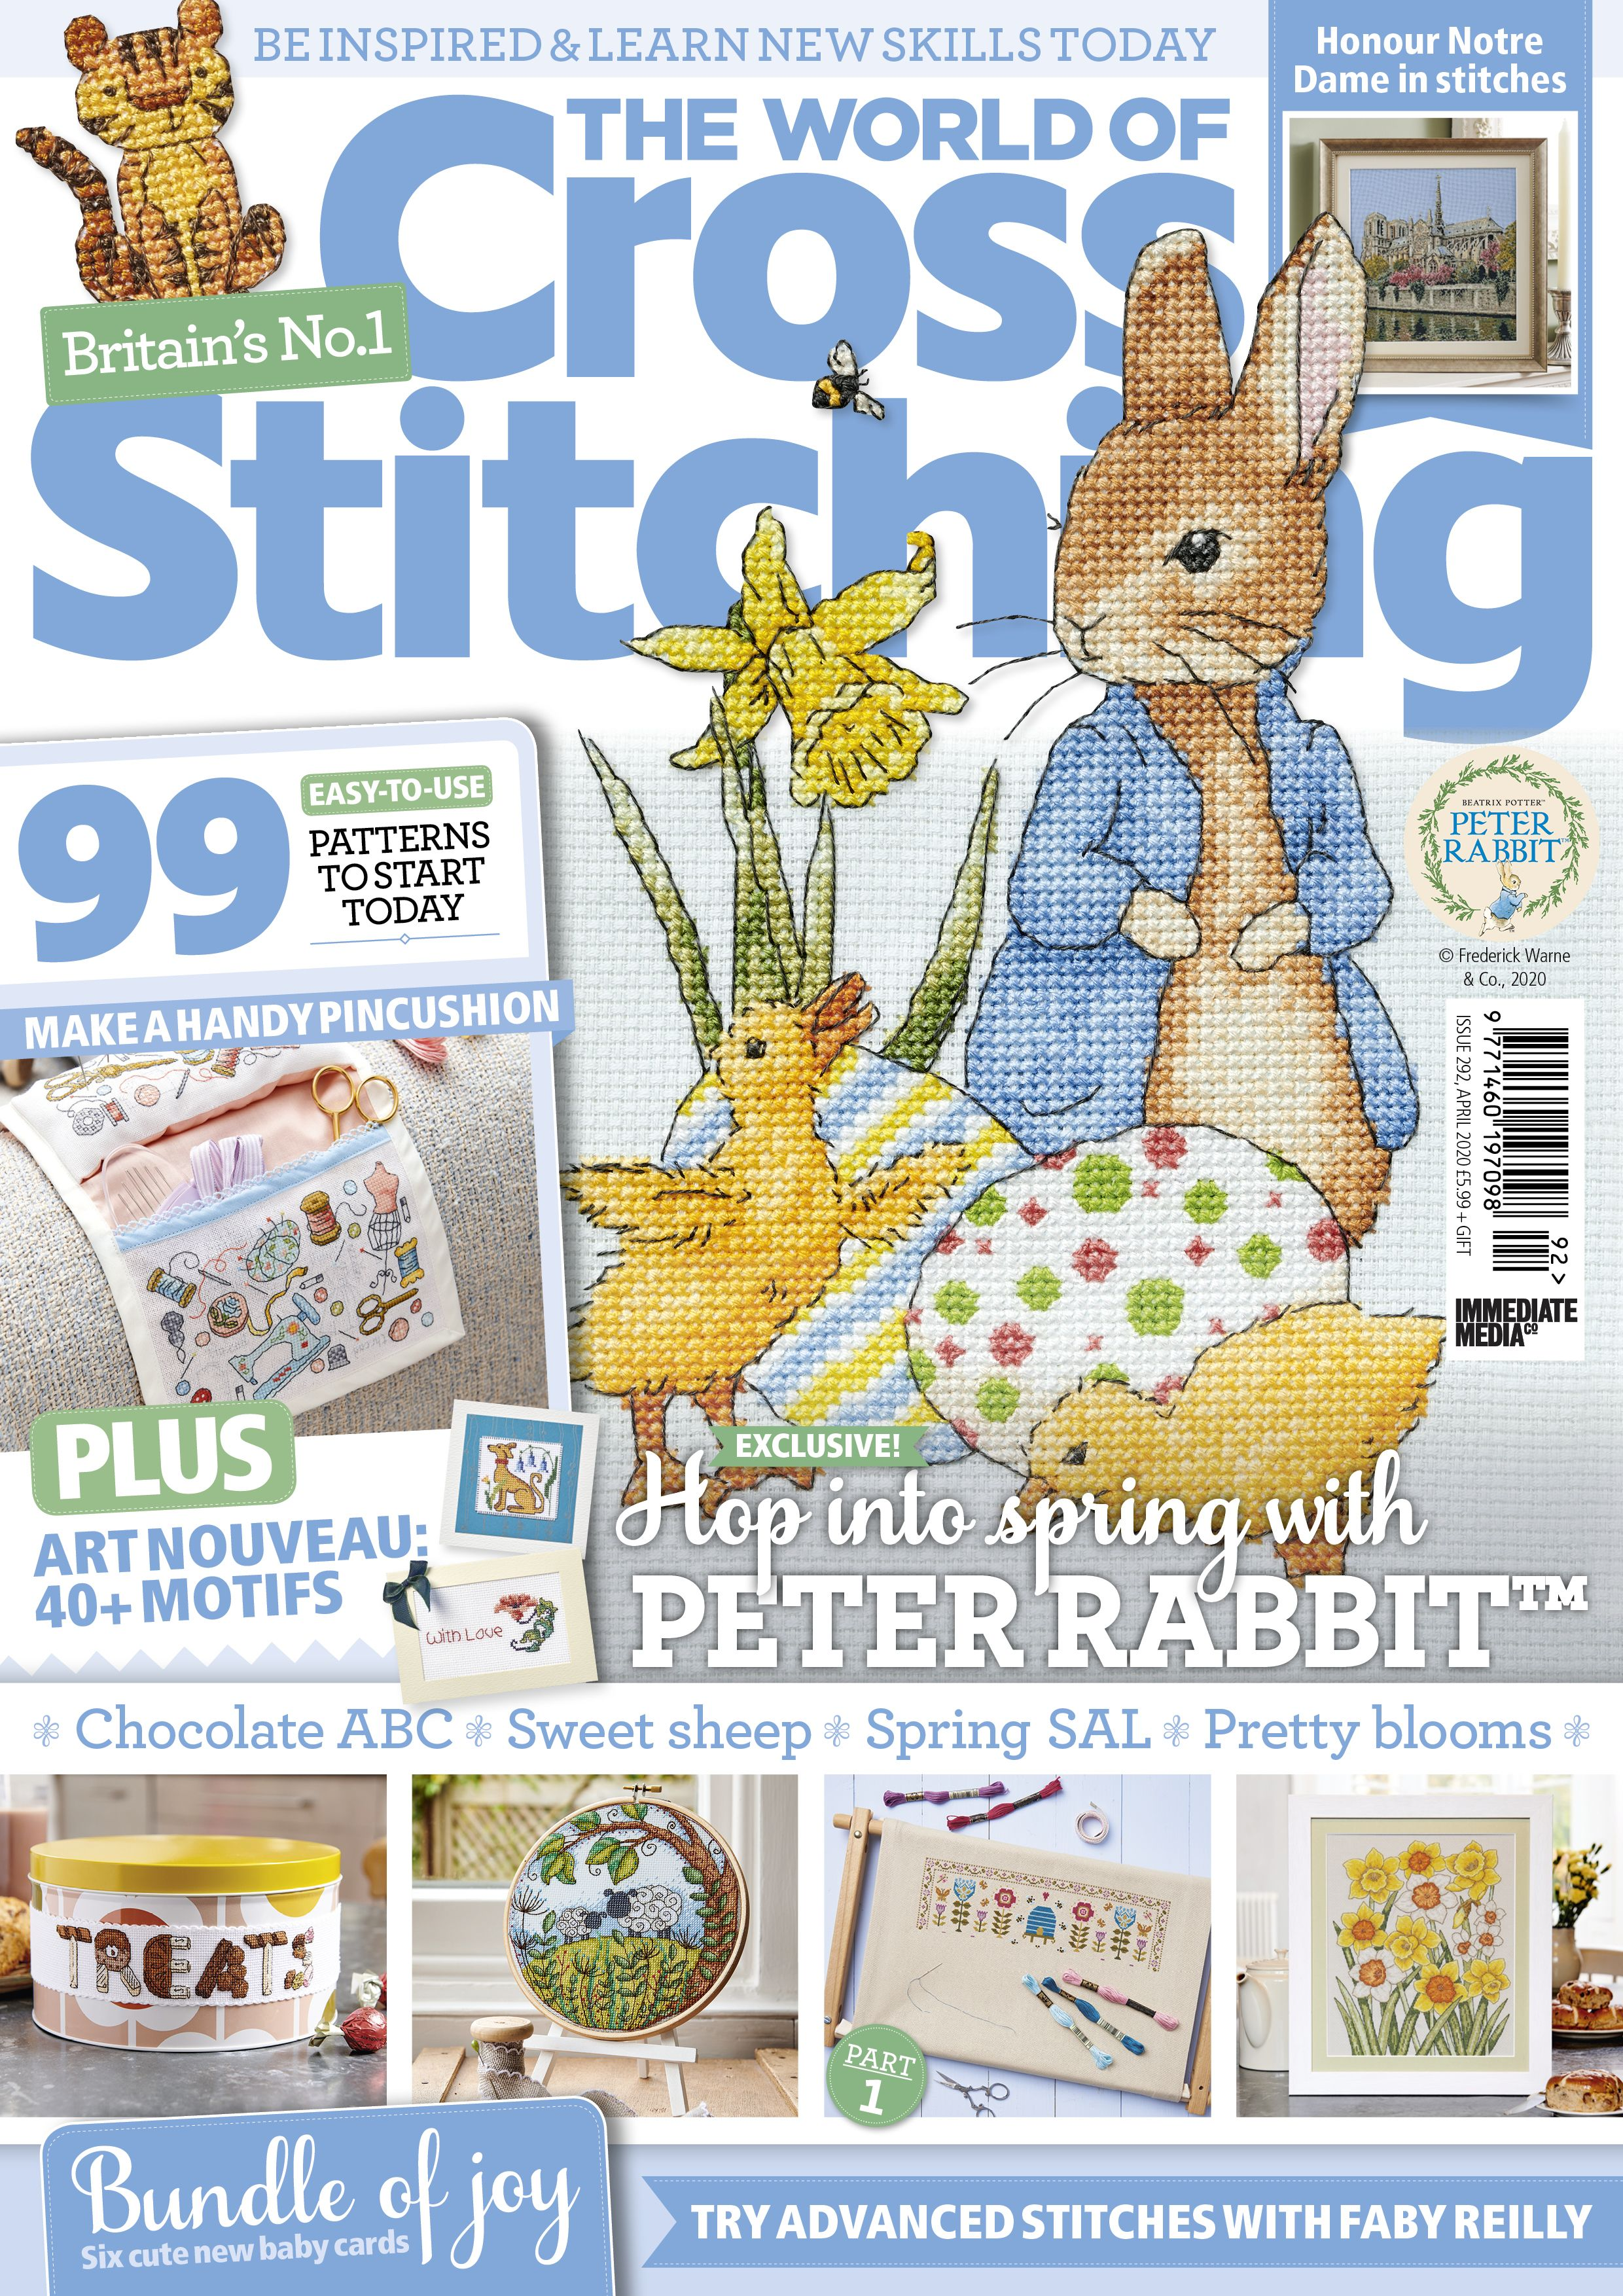 Pin by Sharon Hilsdon on cross stitch in 2020 | Cross stitching